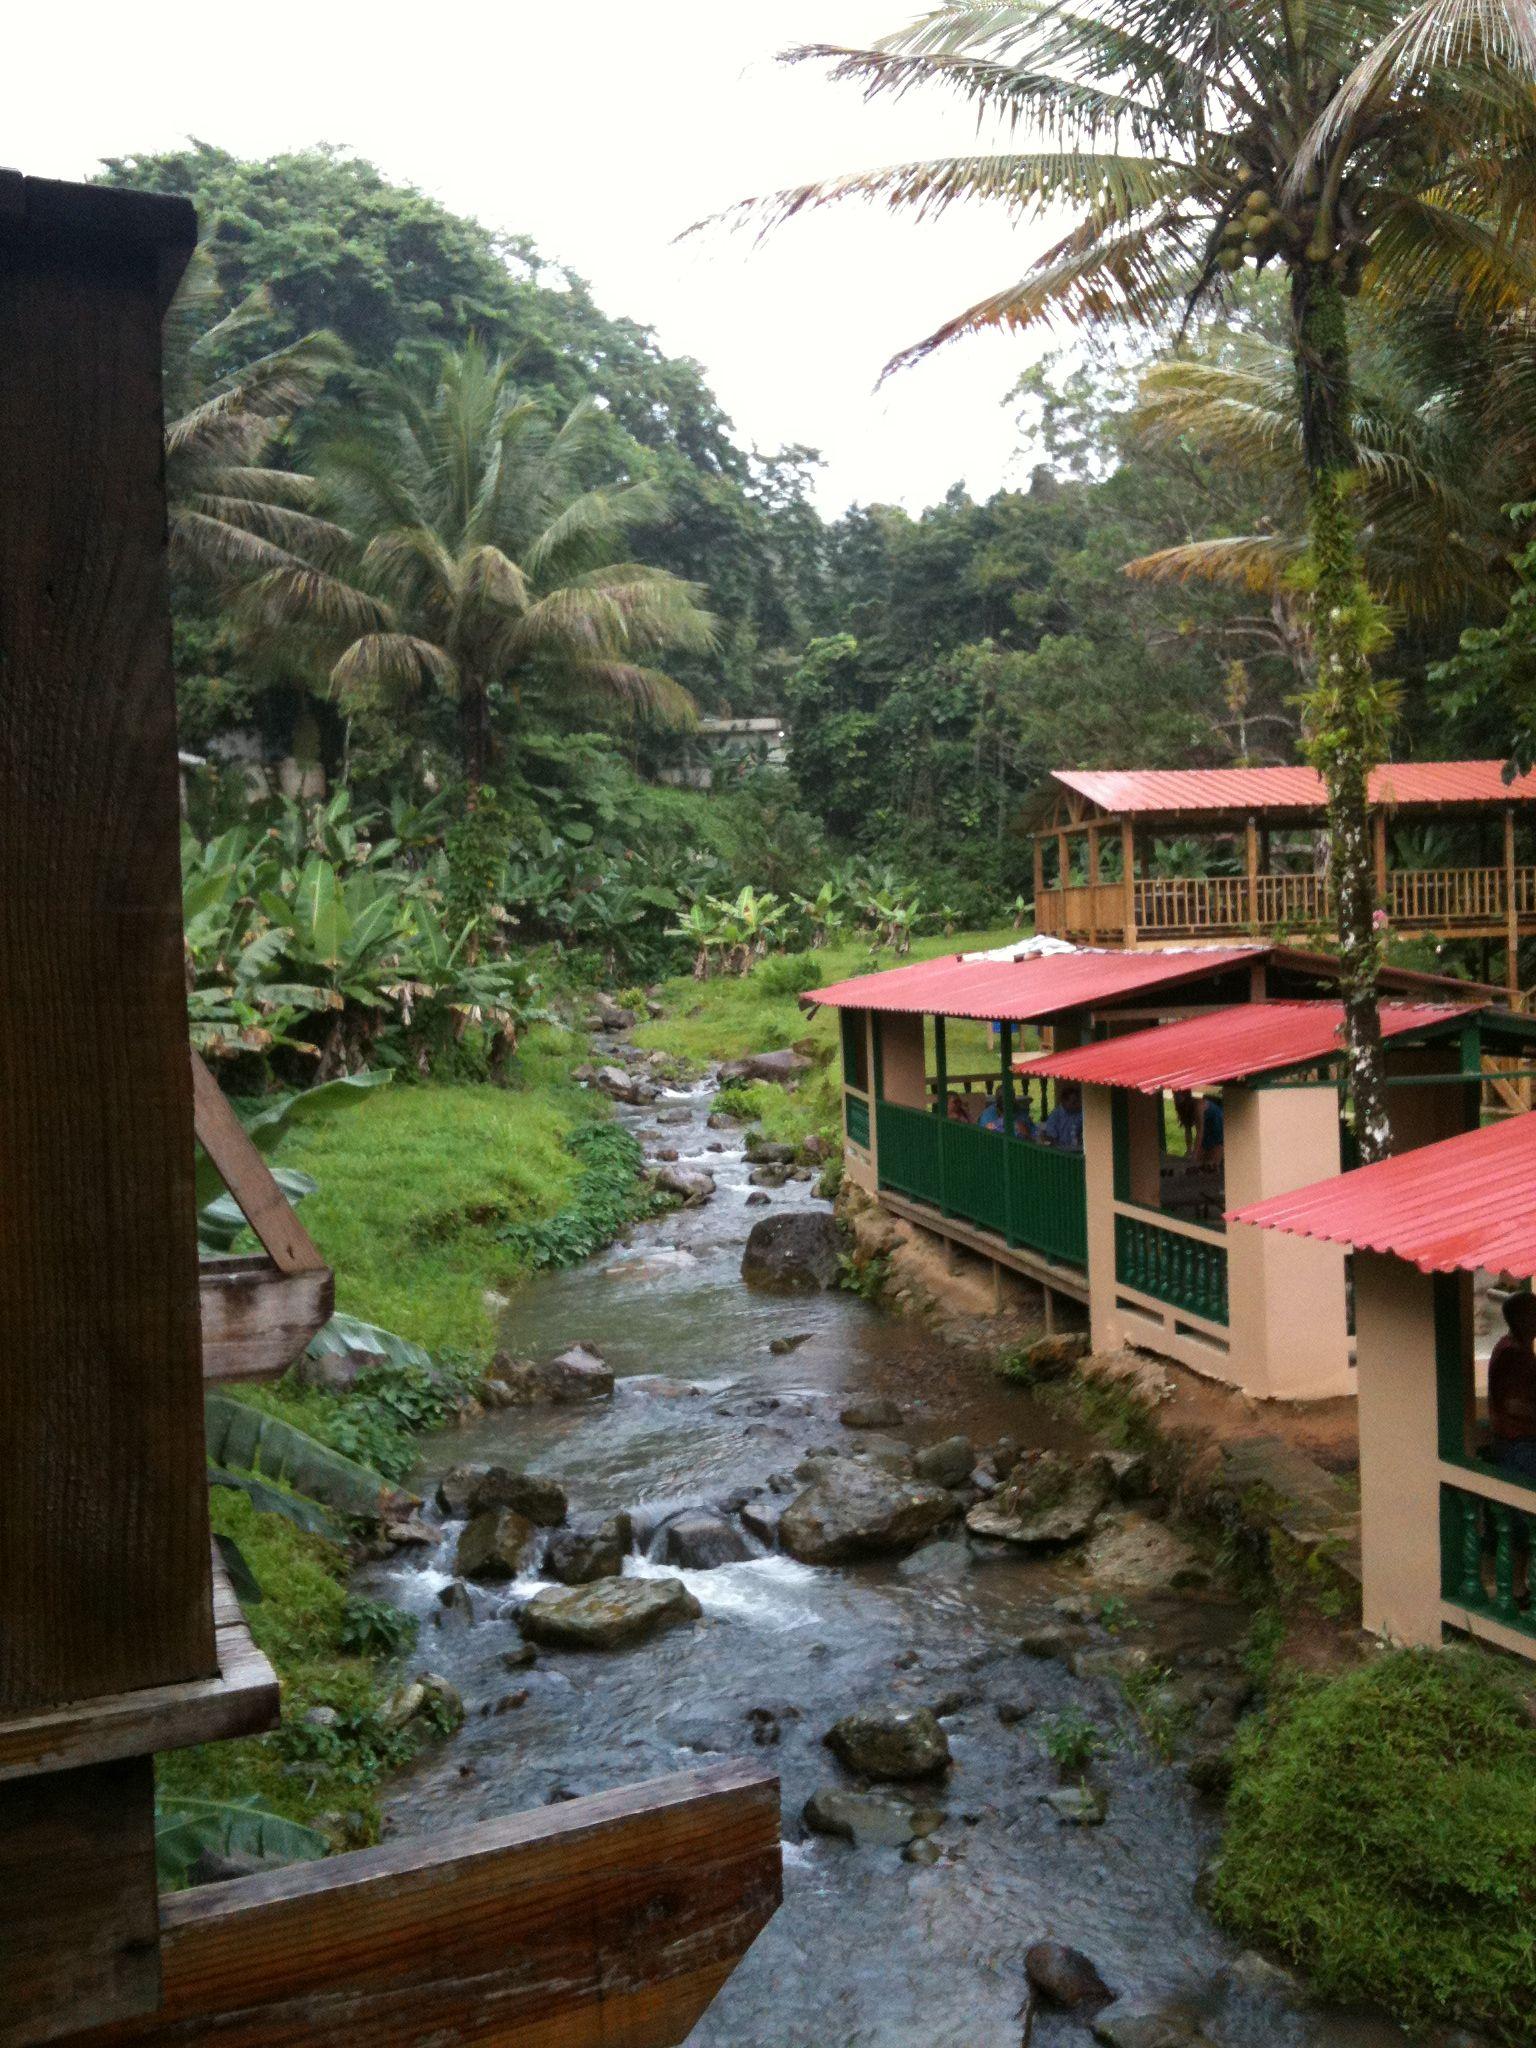 Guavate, Puerto Rico | Places & Coffee Shop. Puerto Rico ...